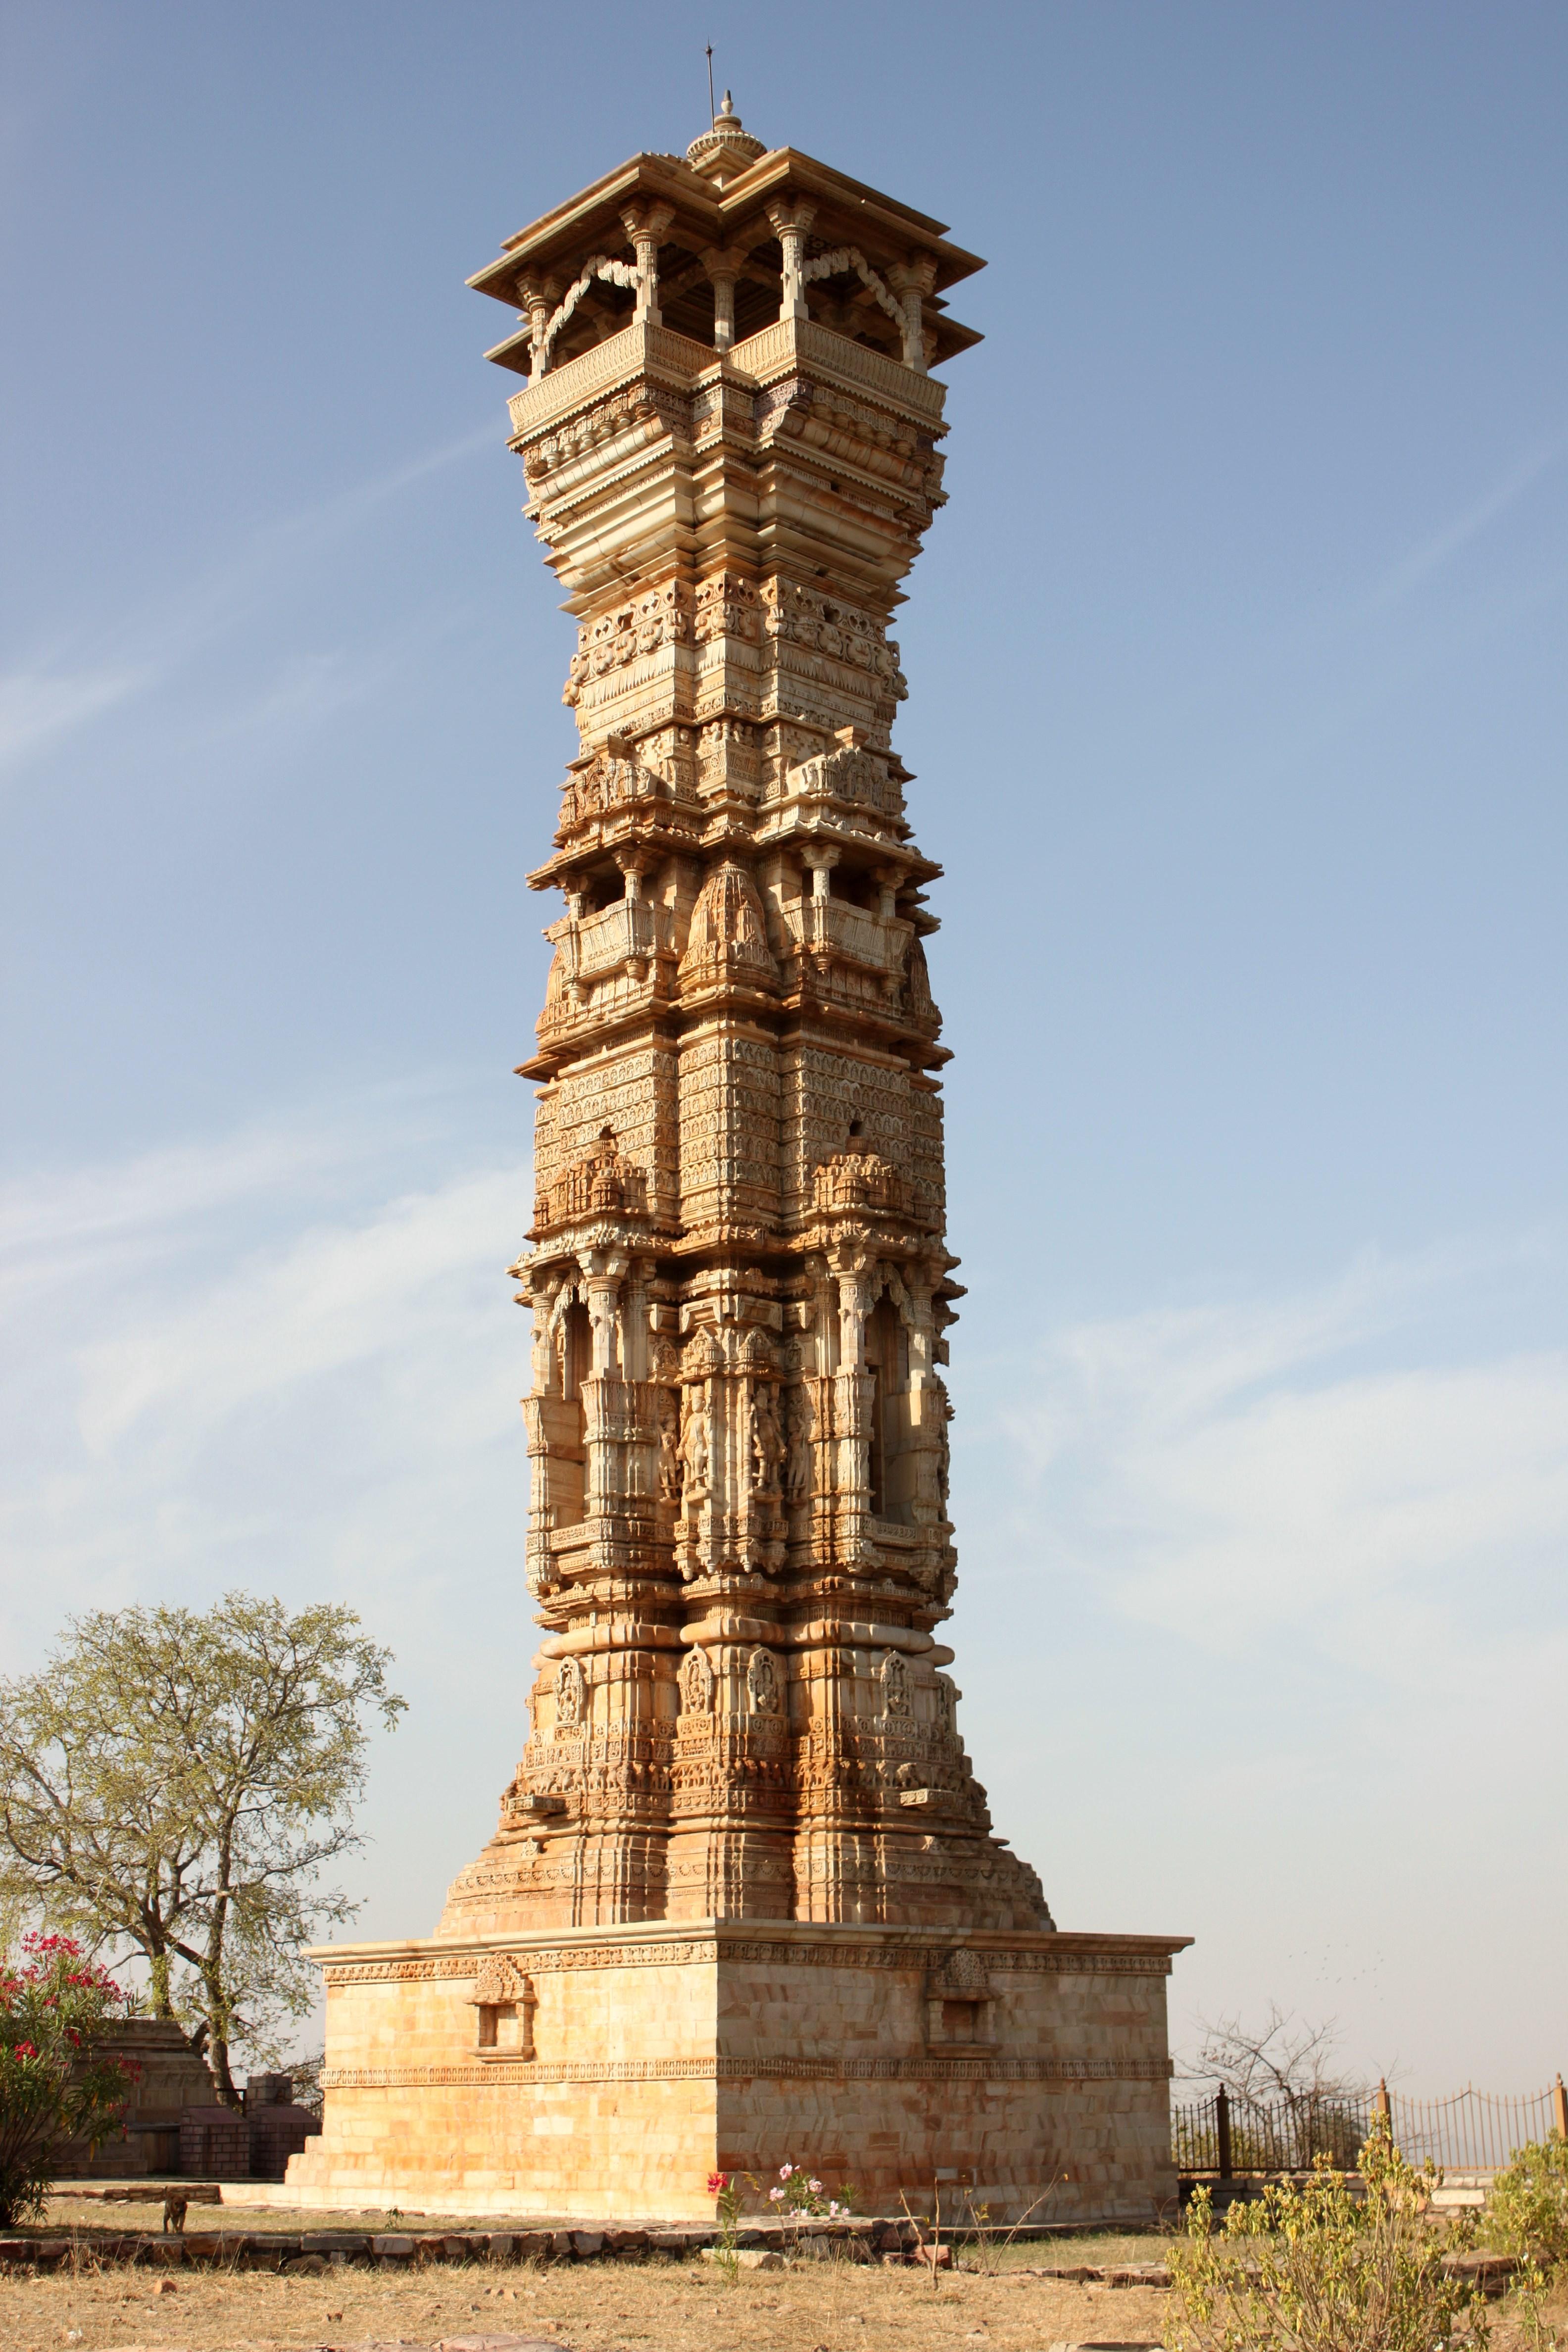 Kirti Stambha (Tower of Fame) 11